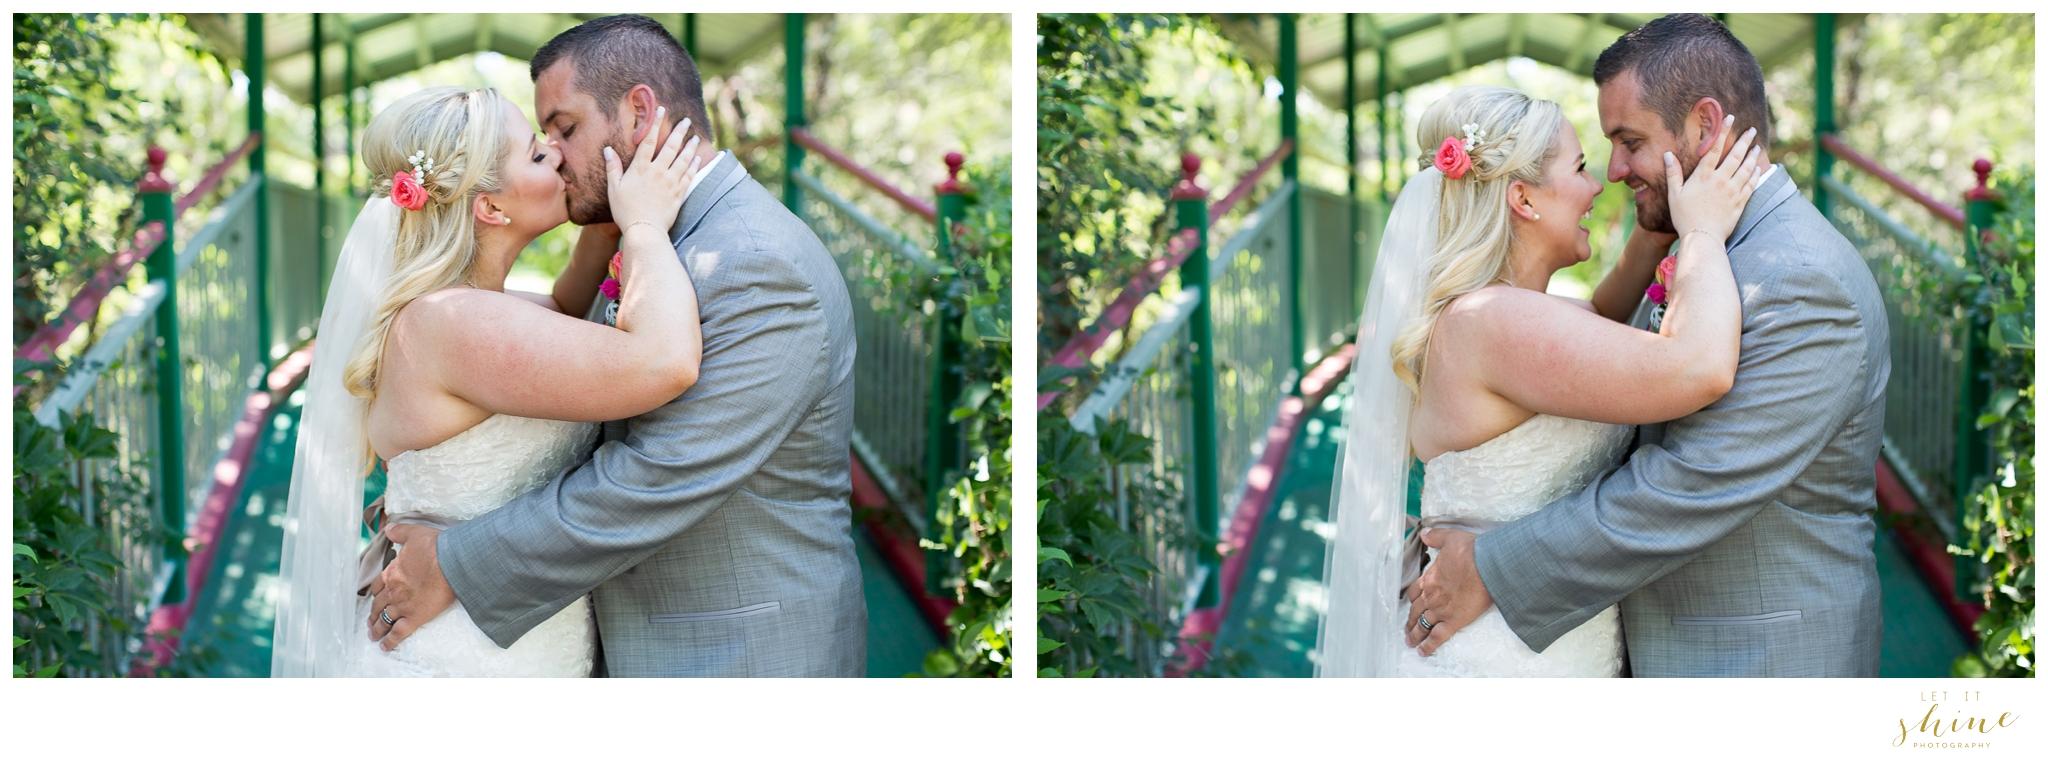 Wild Heart Springs Wedding Idaho Let it Shine Photography-53.jpg